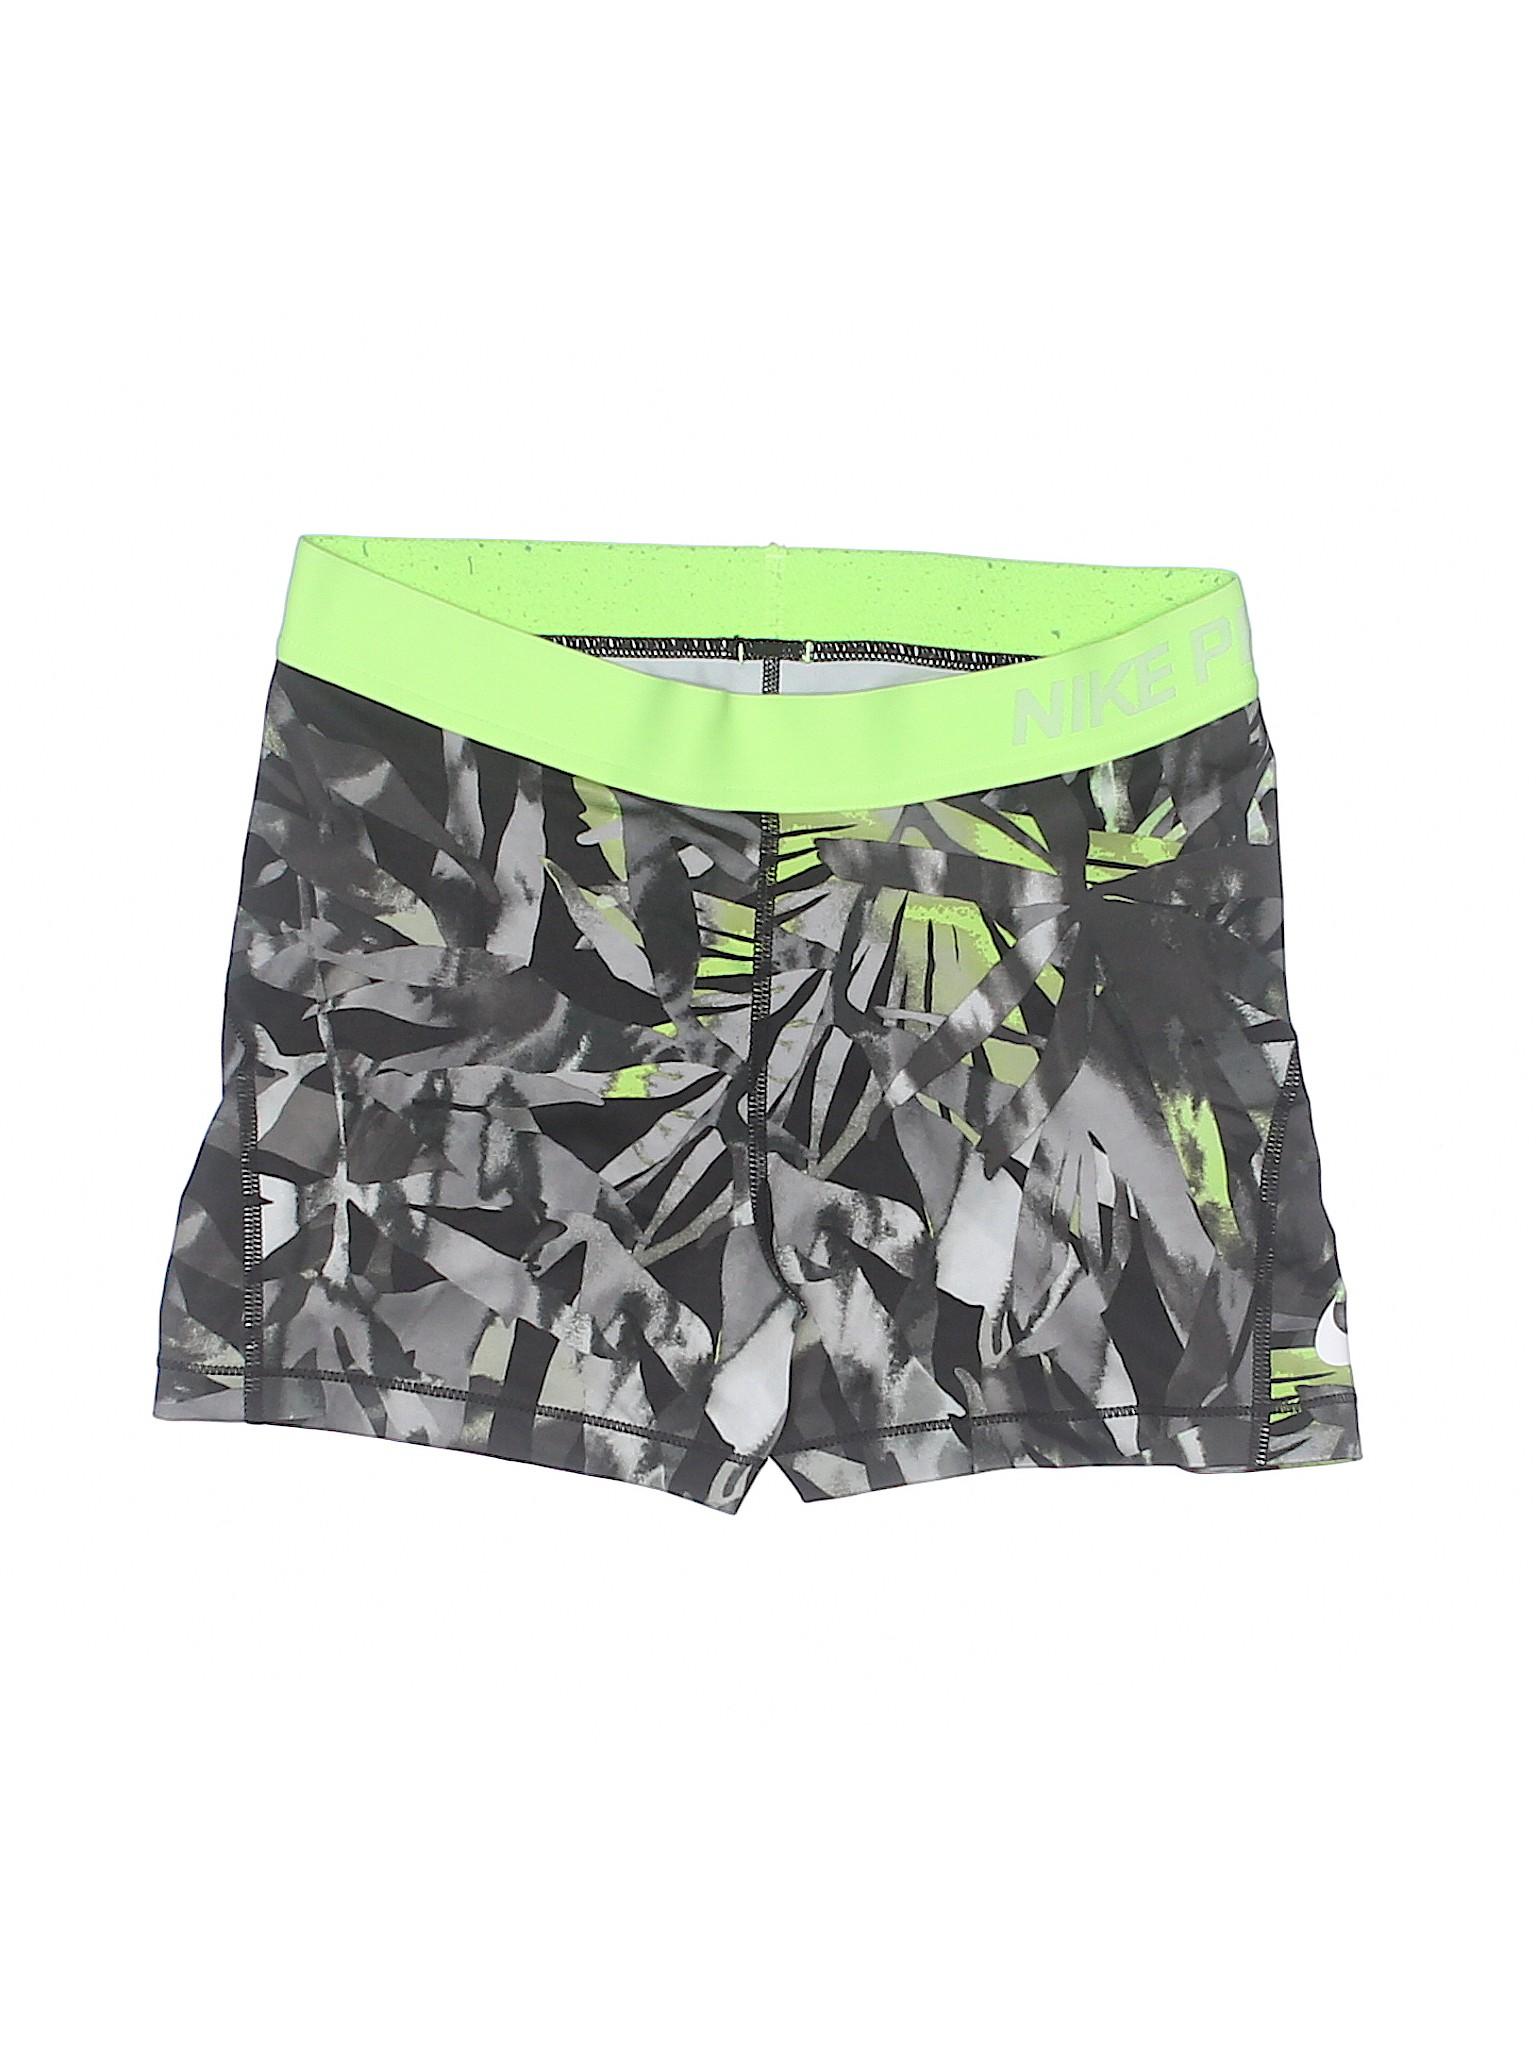 Boutique Boutique Nike Nike Athletic Shorts gT4qX